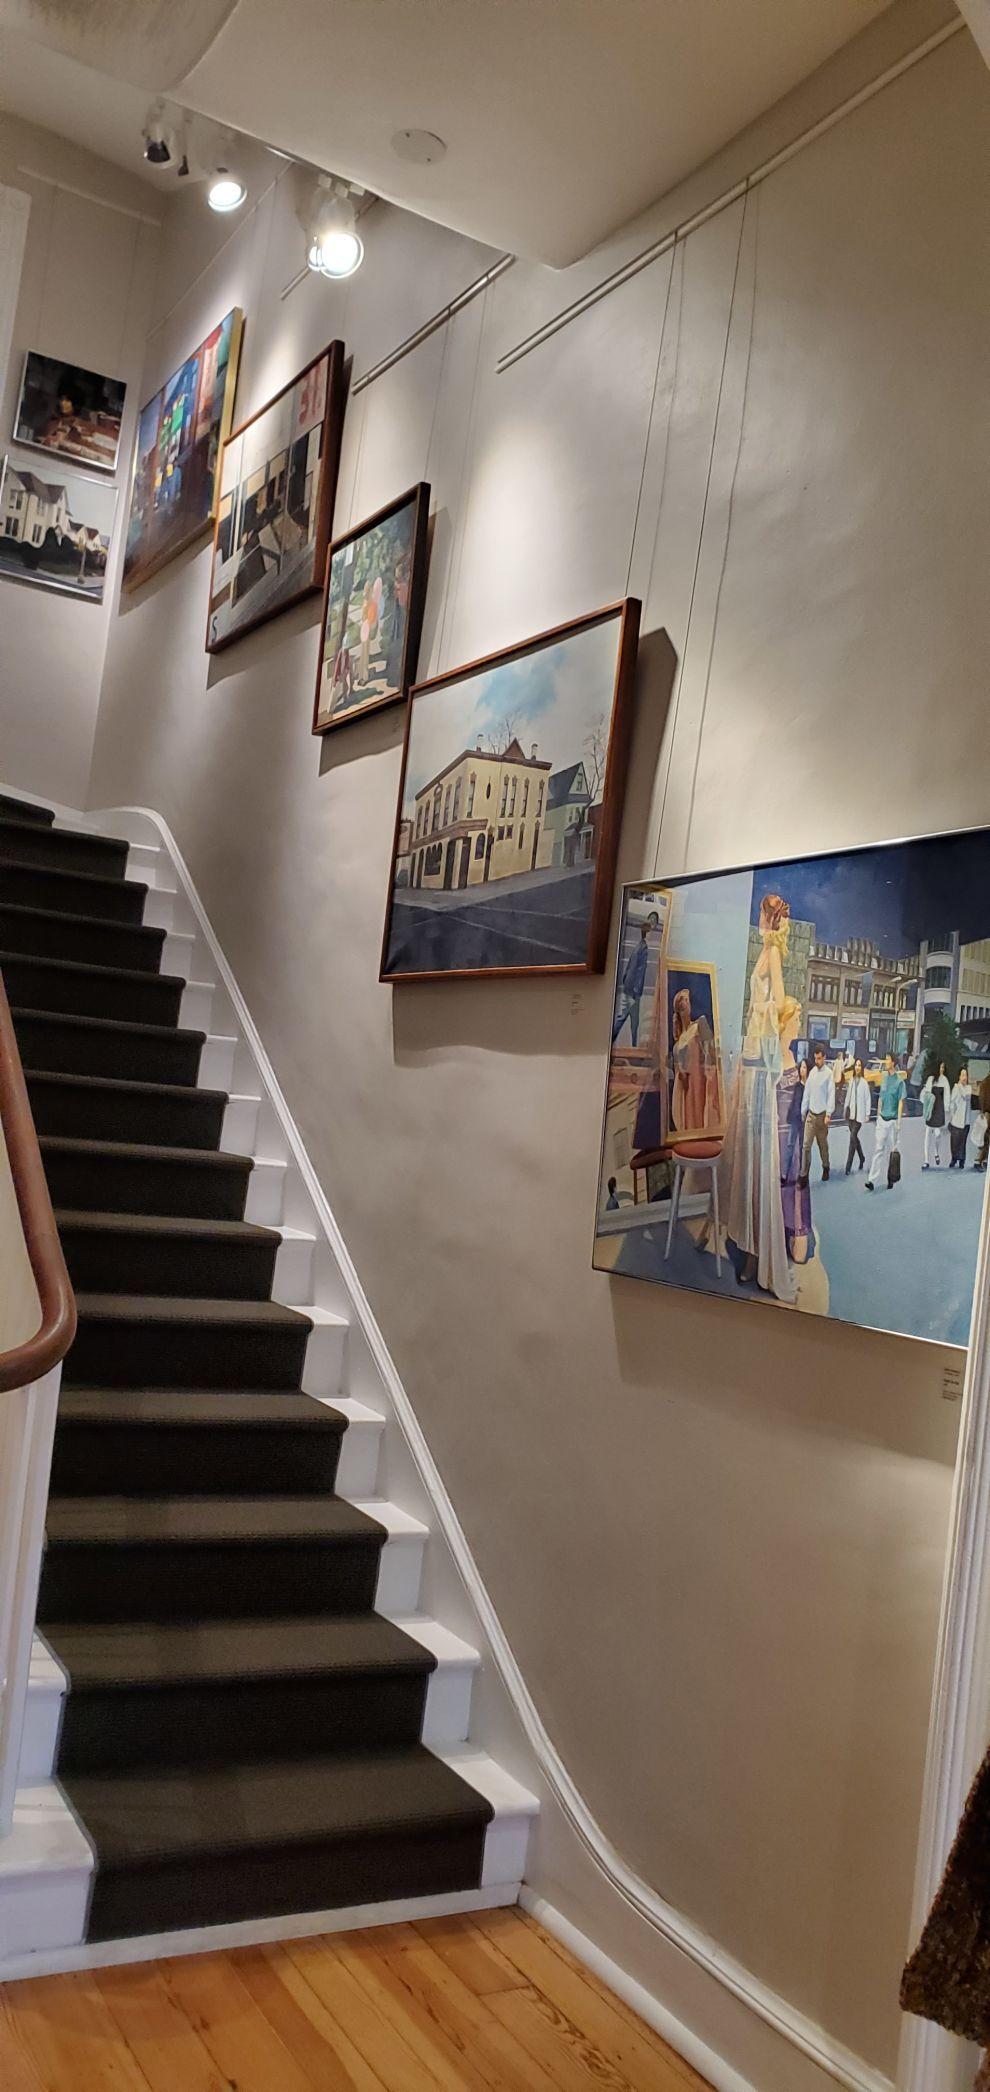 SAMA Lemley Gallery